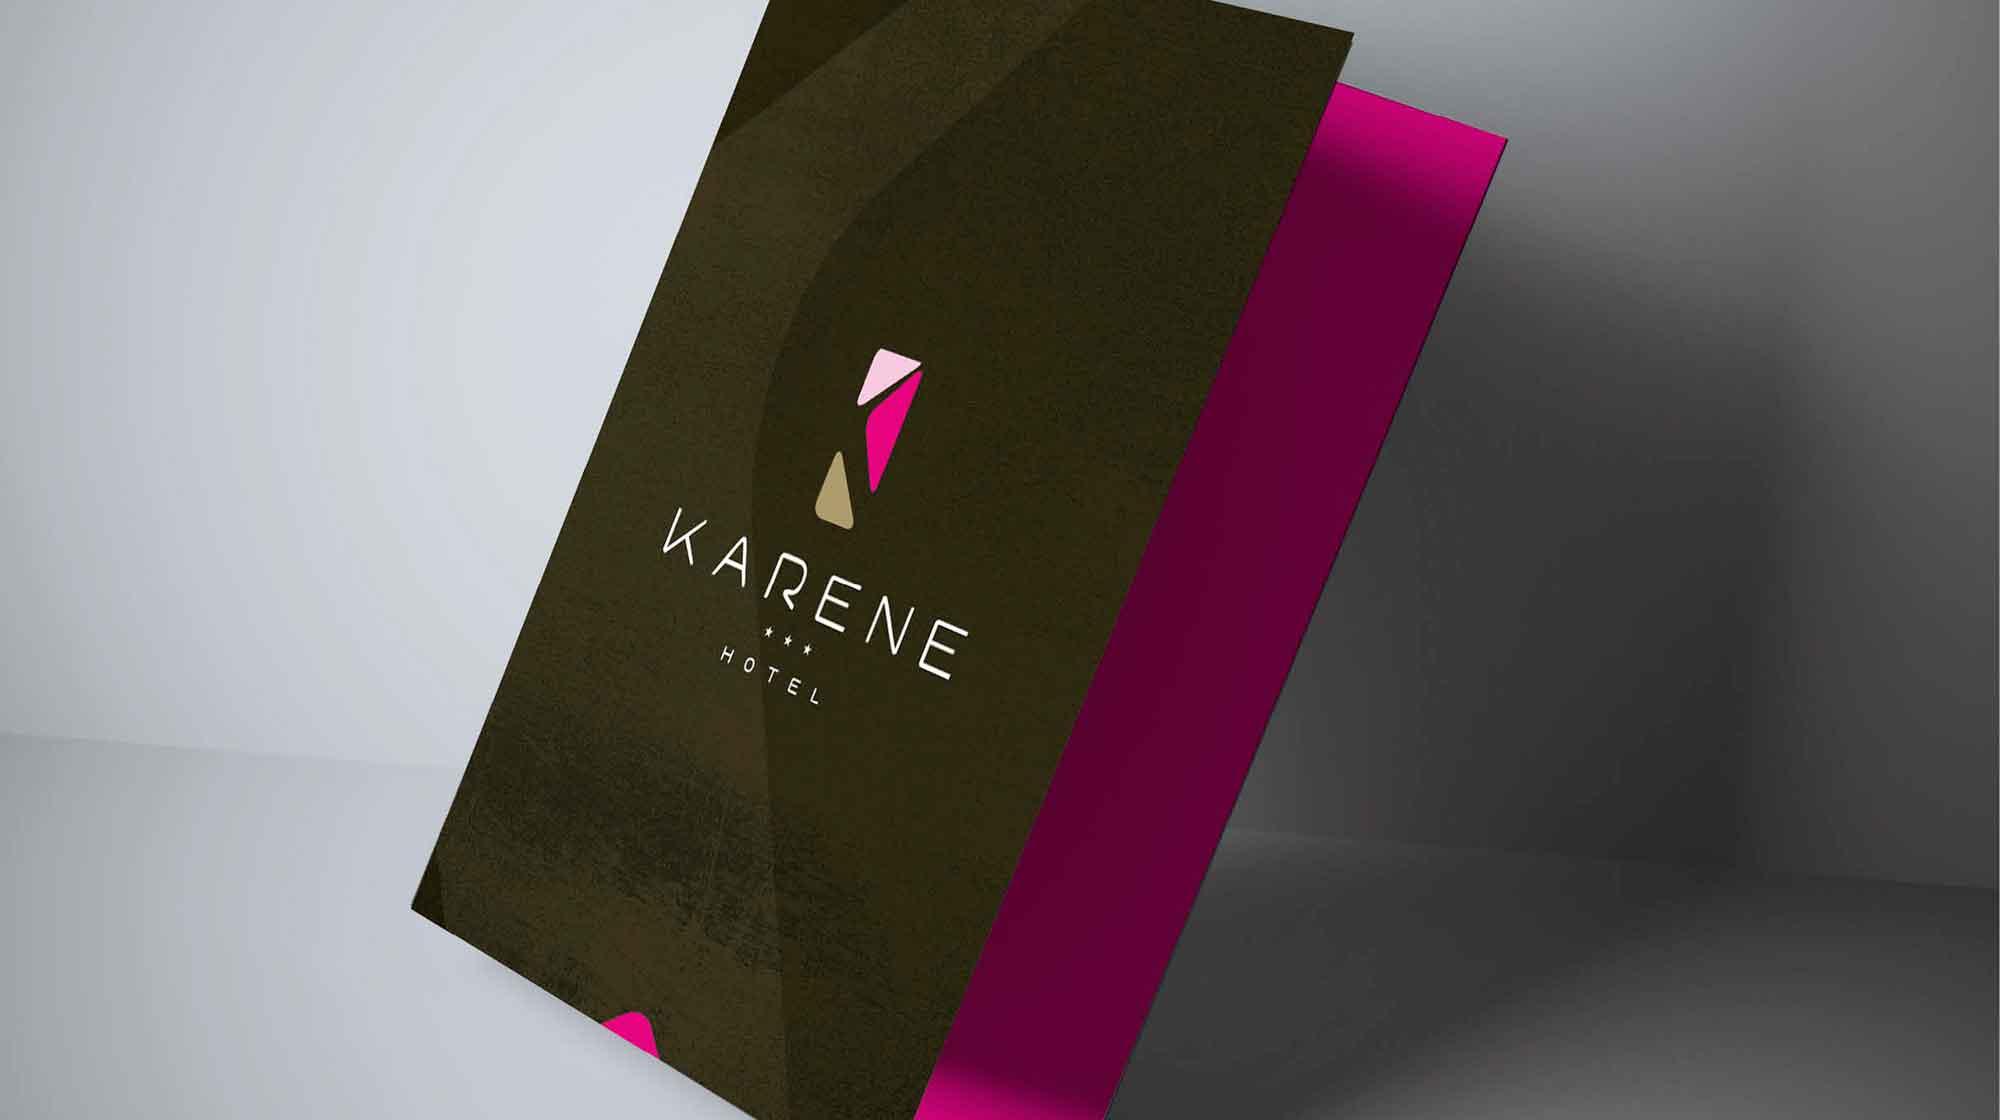 reference-hotel-karene-5